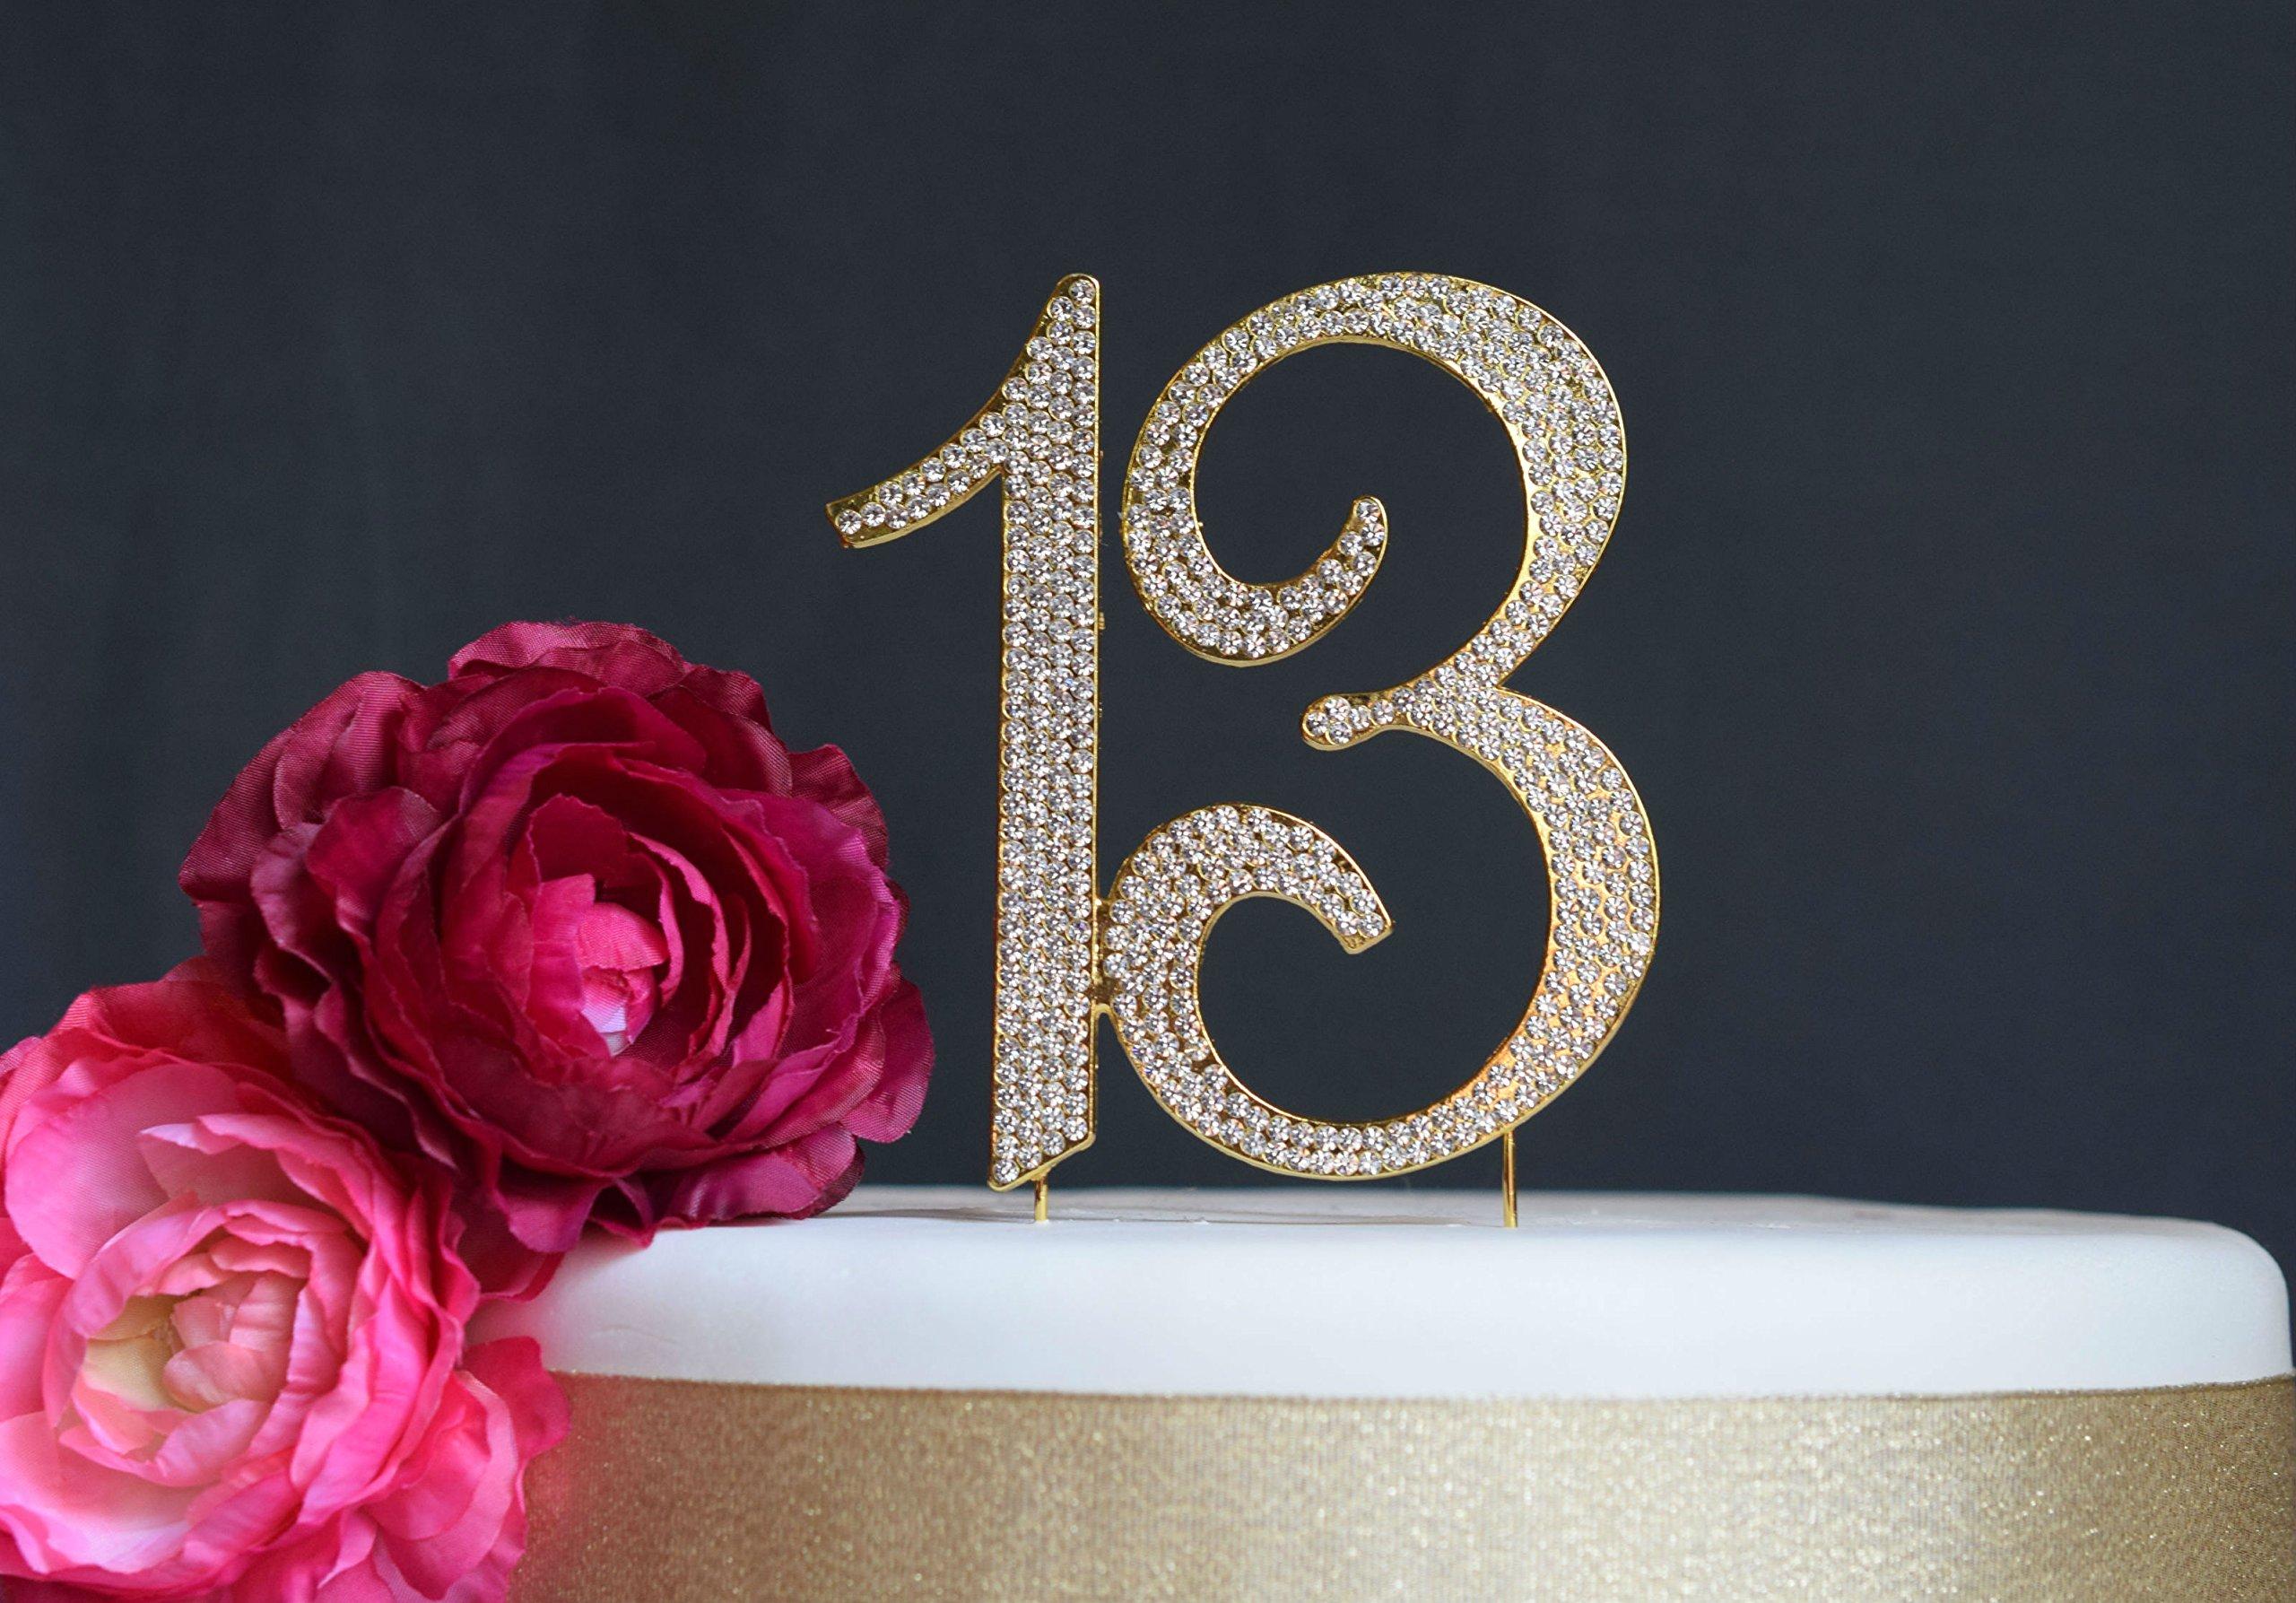 13 GOLD Cake Topper | Premium Bling Crystal Rhinestone Diamond Gems | 13th Birthday or Anniversary Party Decoration Ideas | Quality Metal Alloy | Perfect Keepsake (13 Gold)